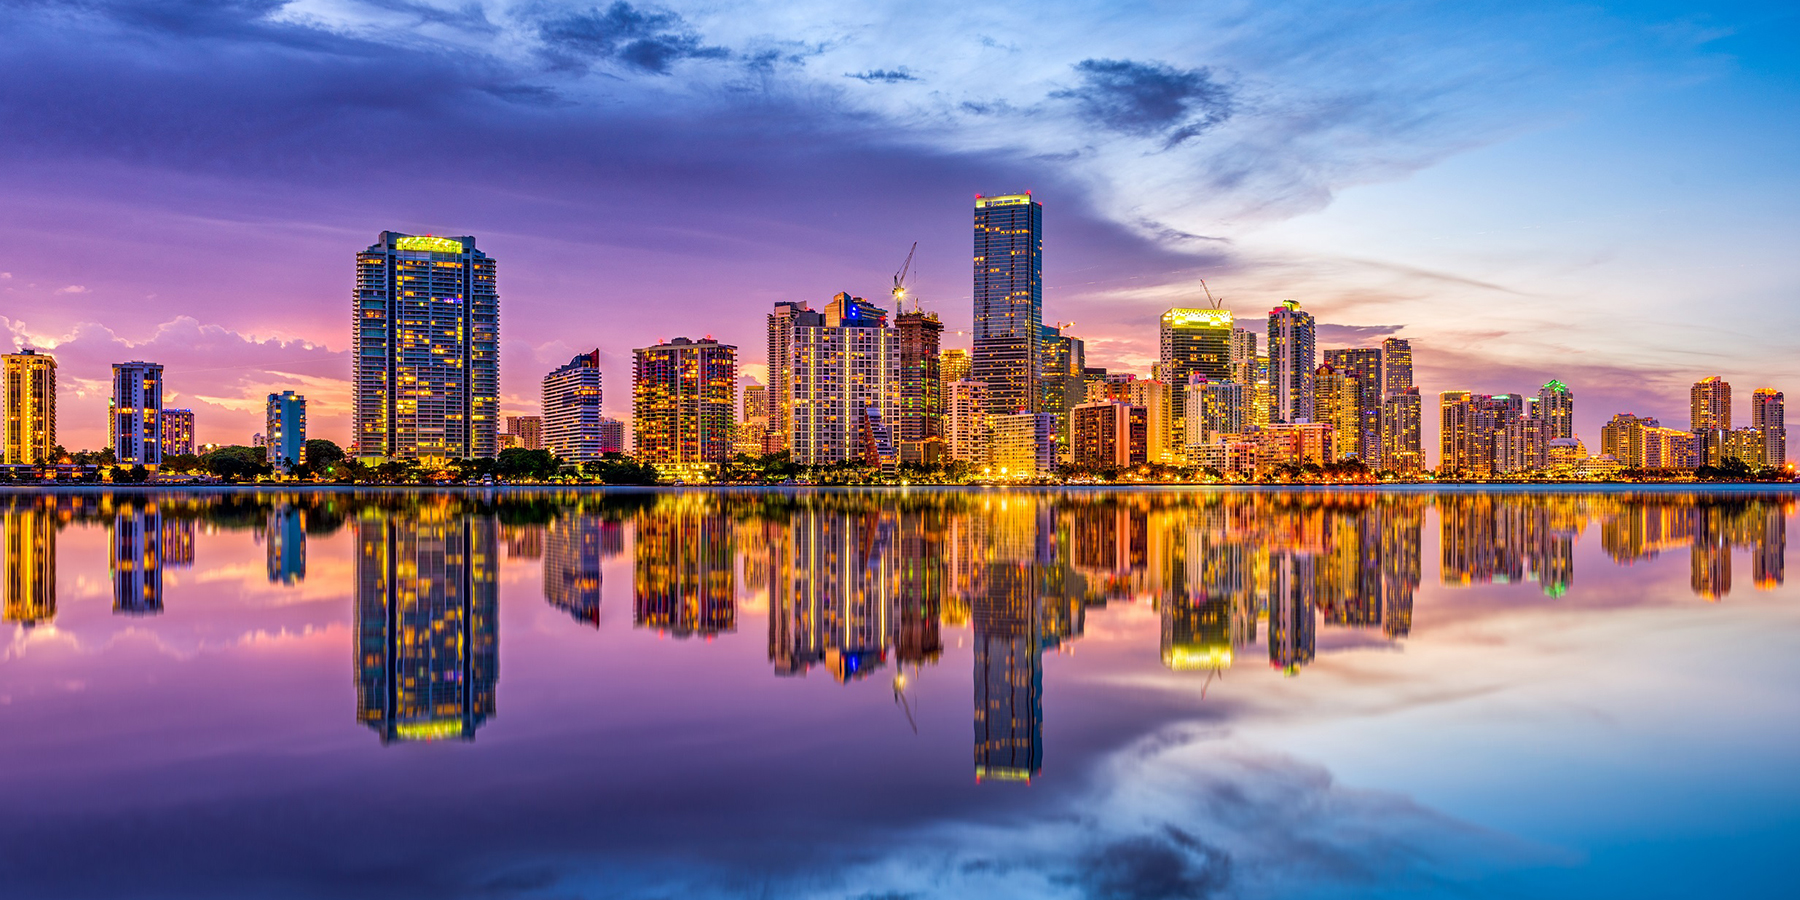 Miami Yacht Show Vs Boat Show